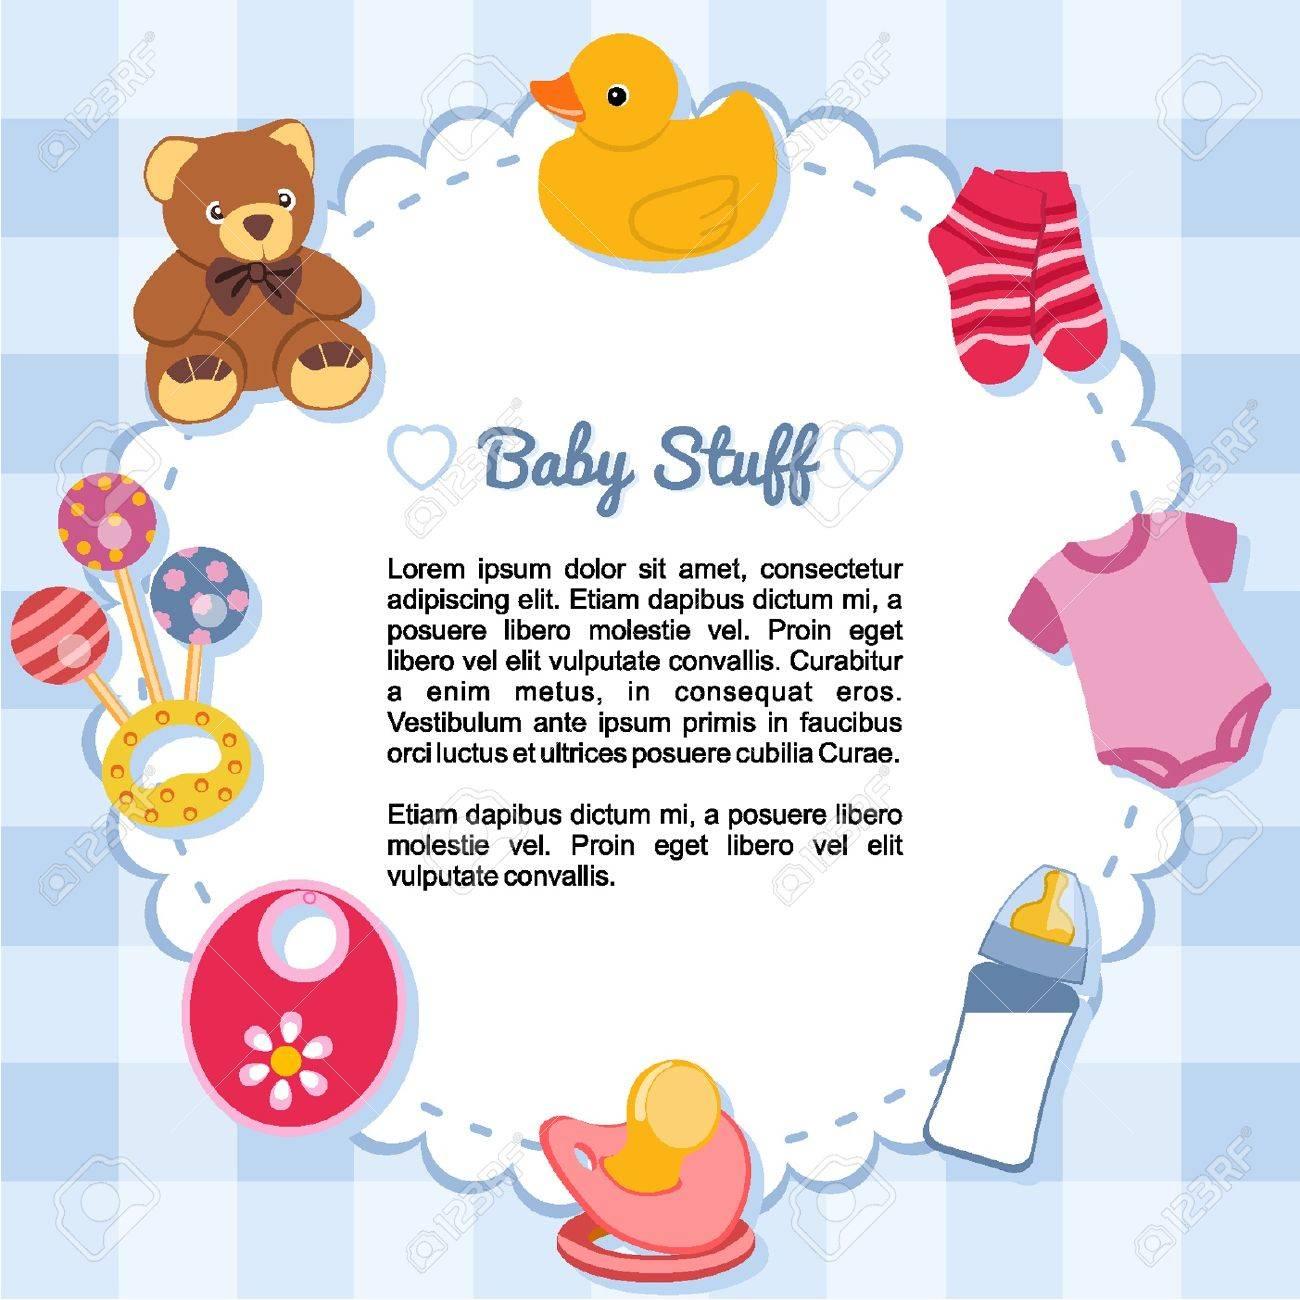 Objetos para bebés que forman un marco Foto de archivo - 18134307